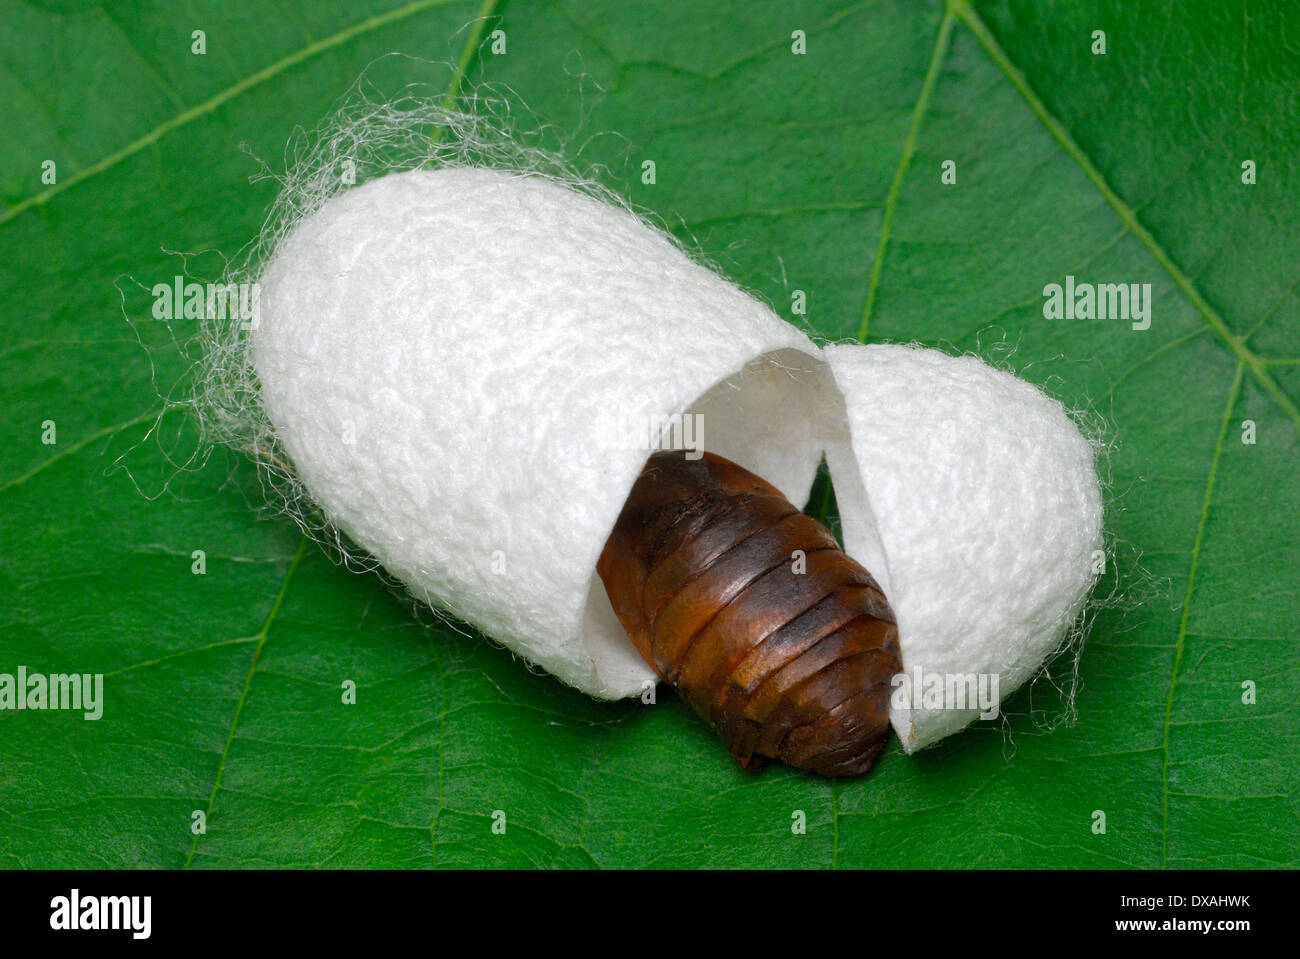 mulberry silkworm moth stock photo 67845727 alamy butterflies clipart free butterflies clipart free